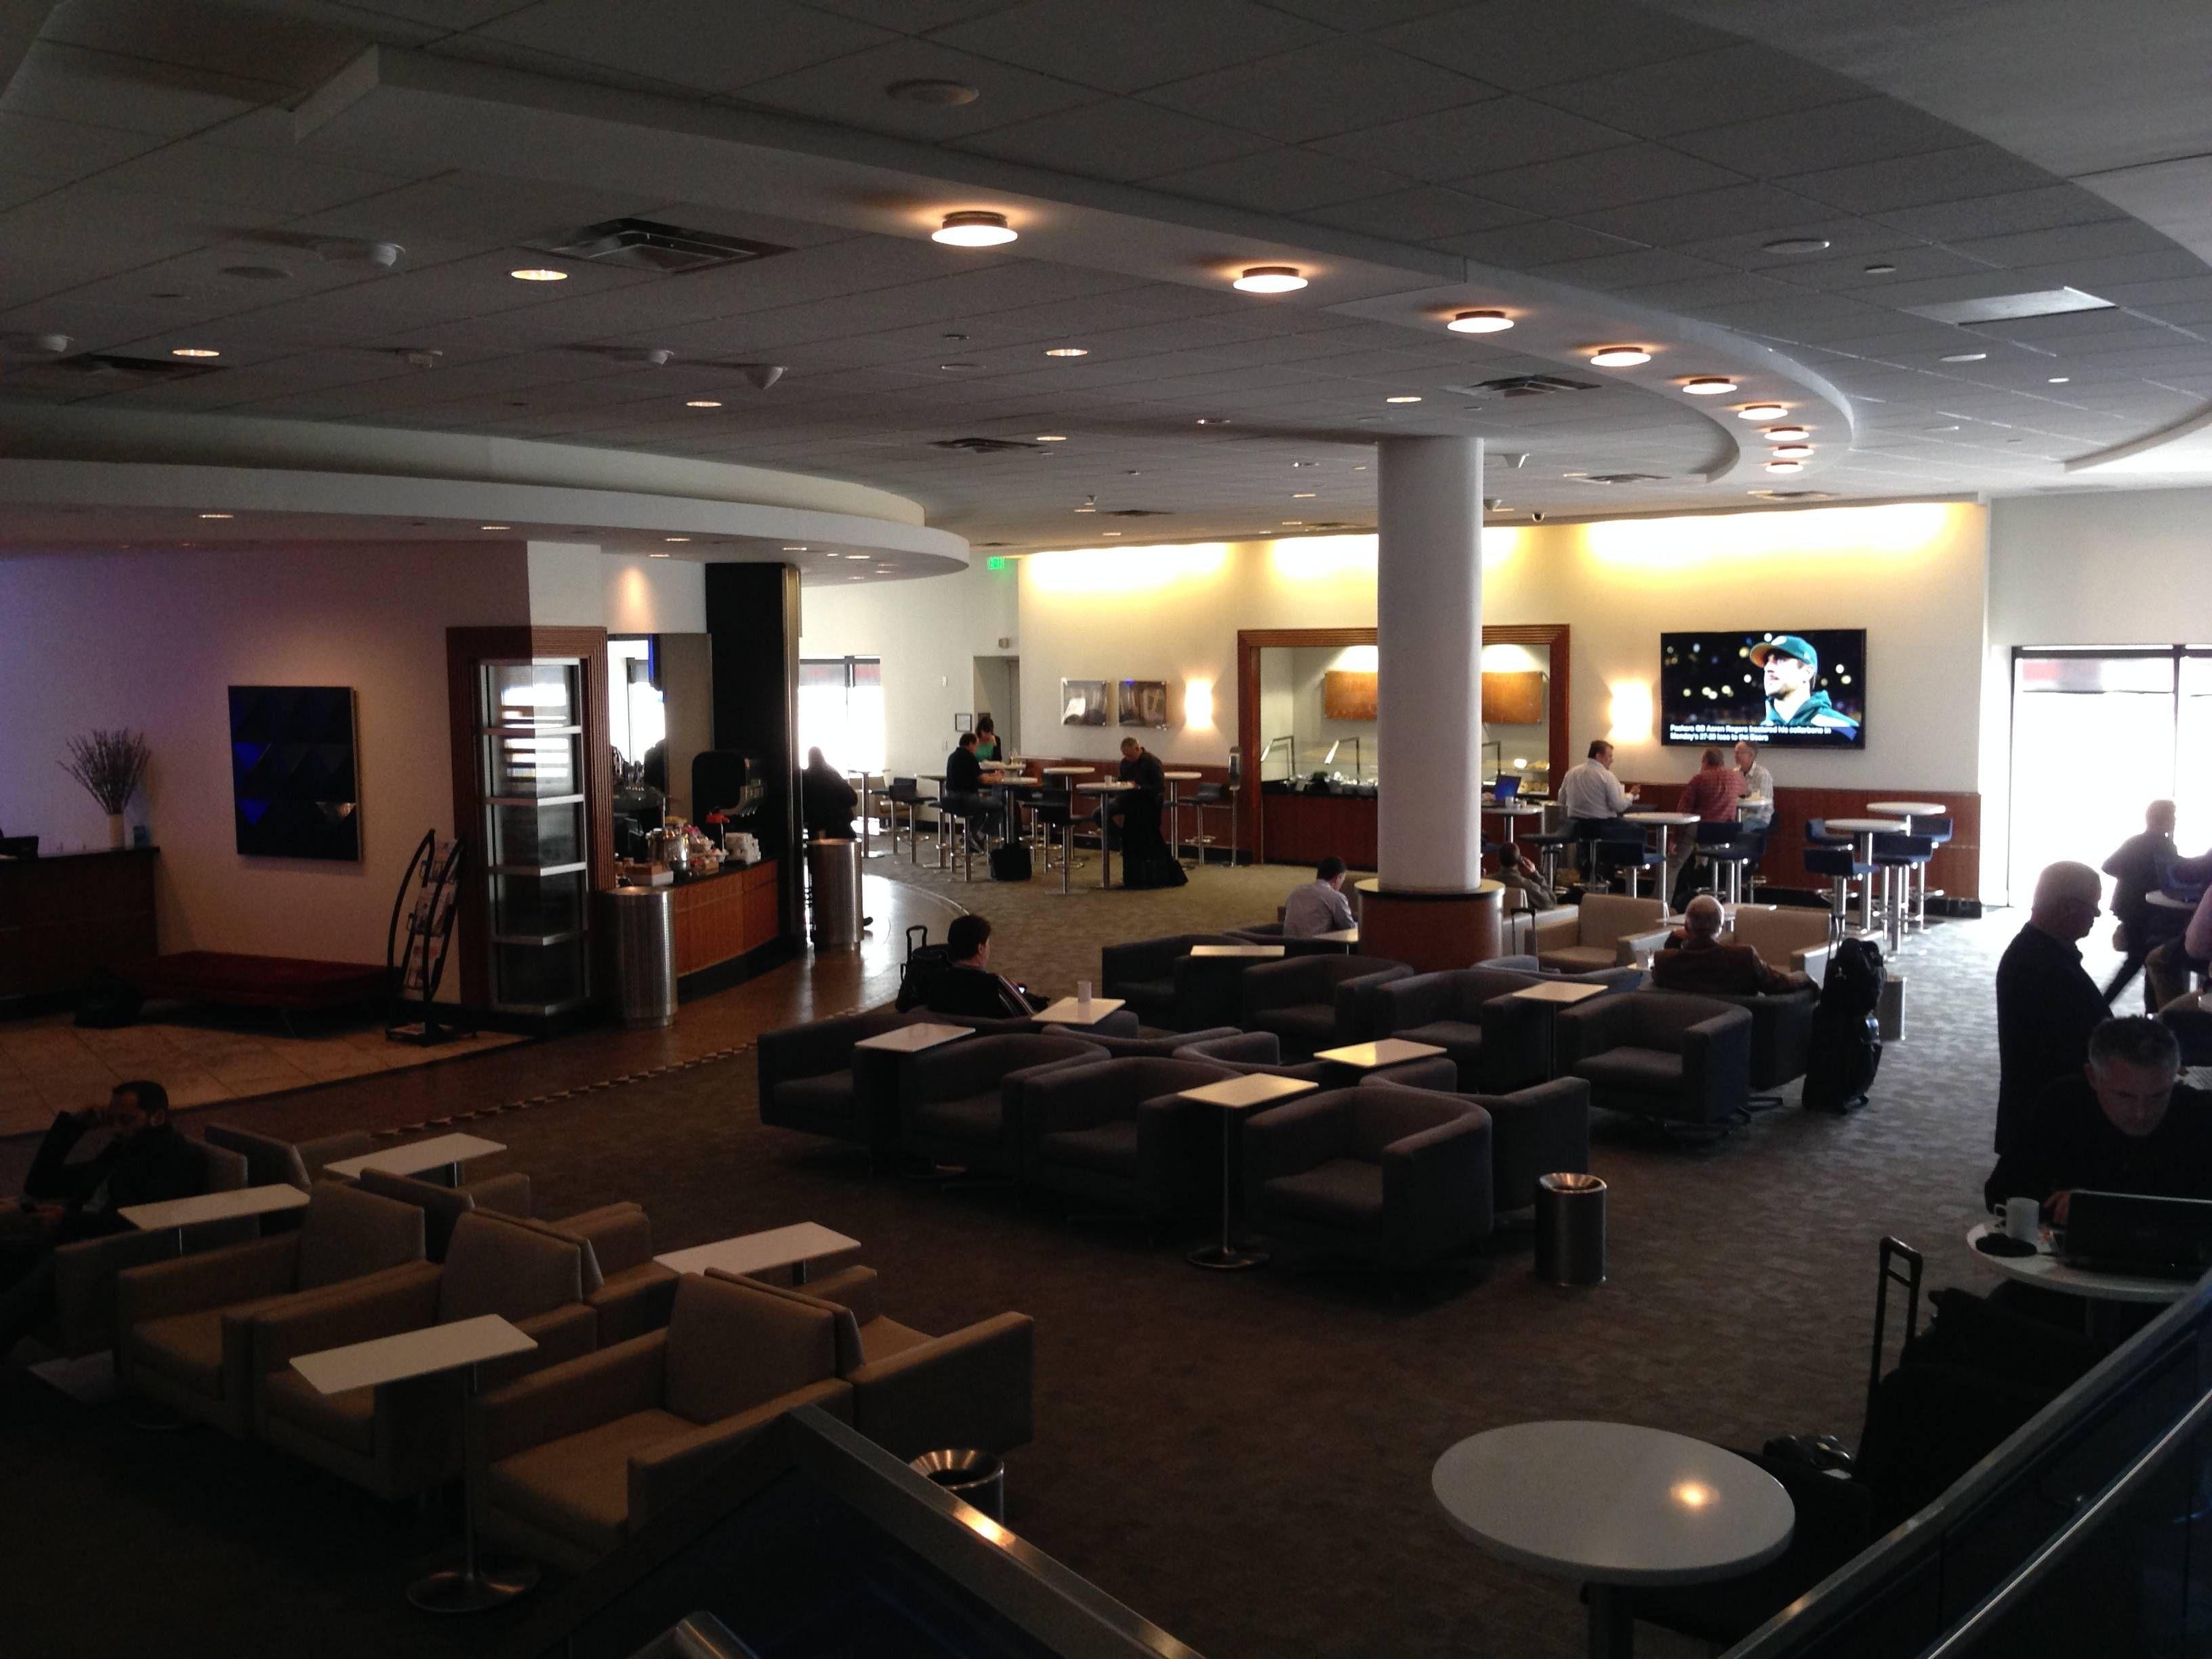 sala vip delta sky club no aeroporto de atlanta atl terminal a passageiro de primeira. Black Bedroom Furniture Sets. Home Design Ideas